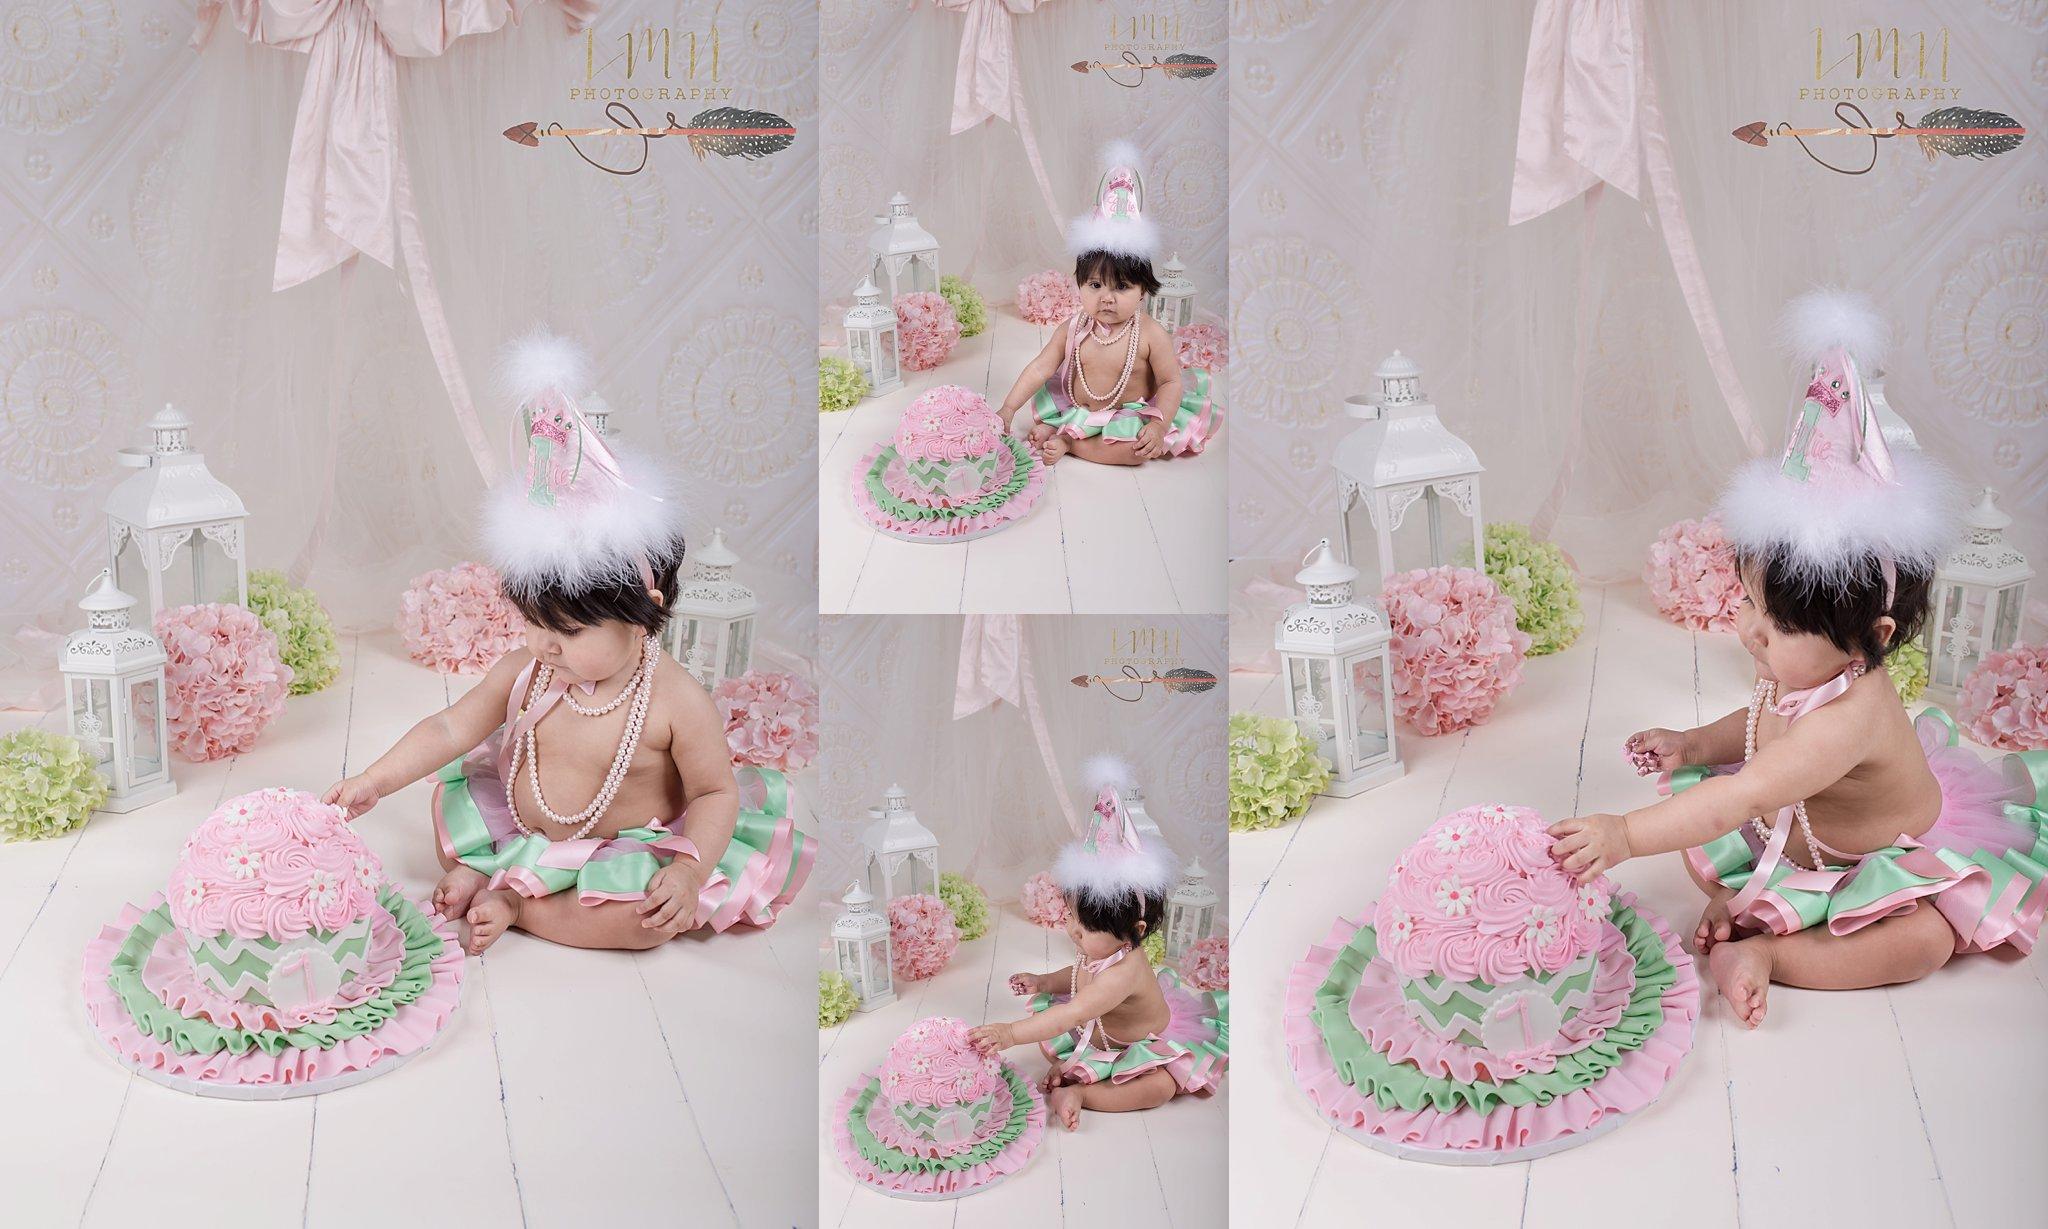 Cypress TX Cake Smash Photographer 77433 77429